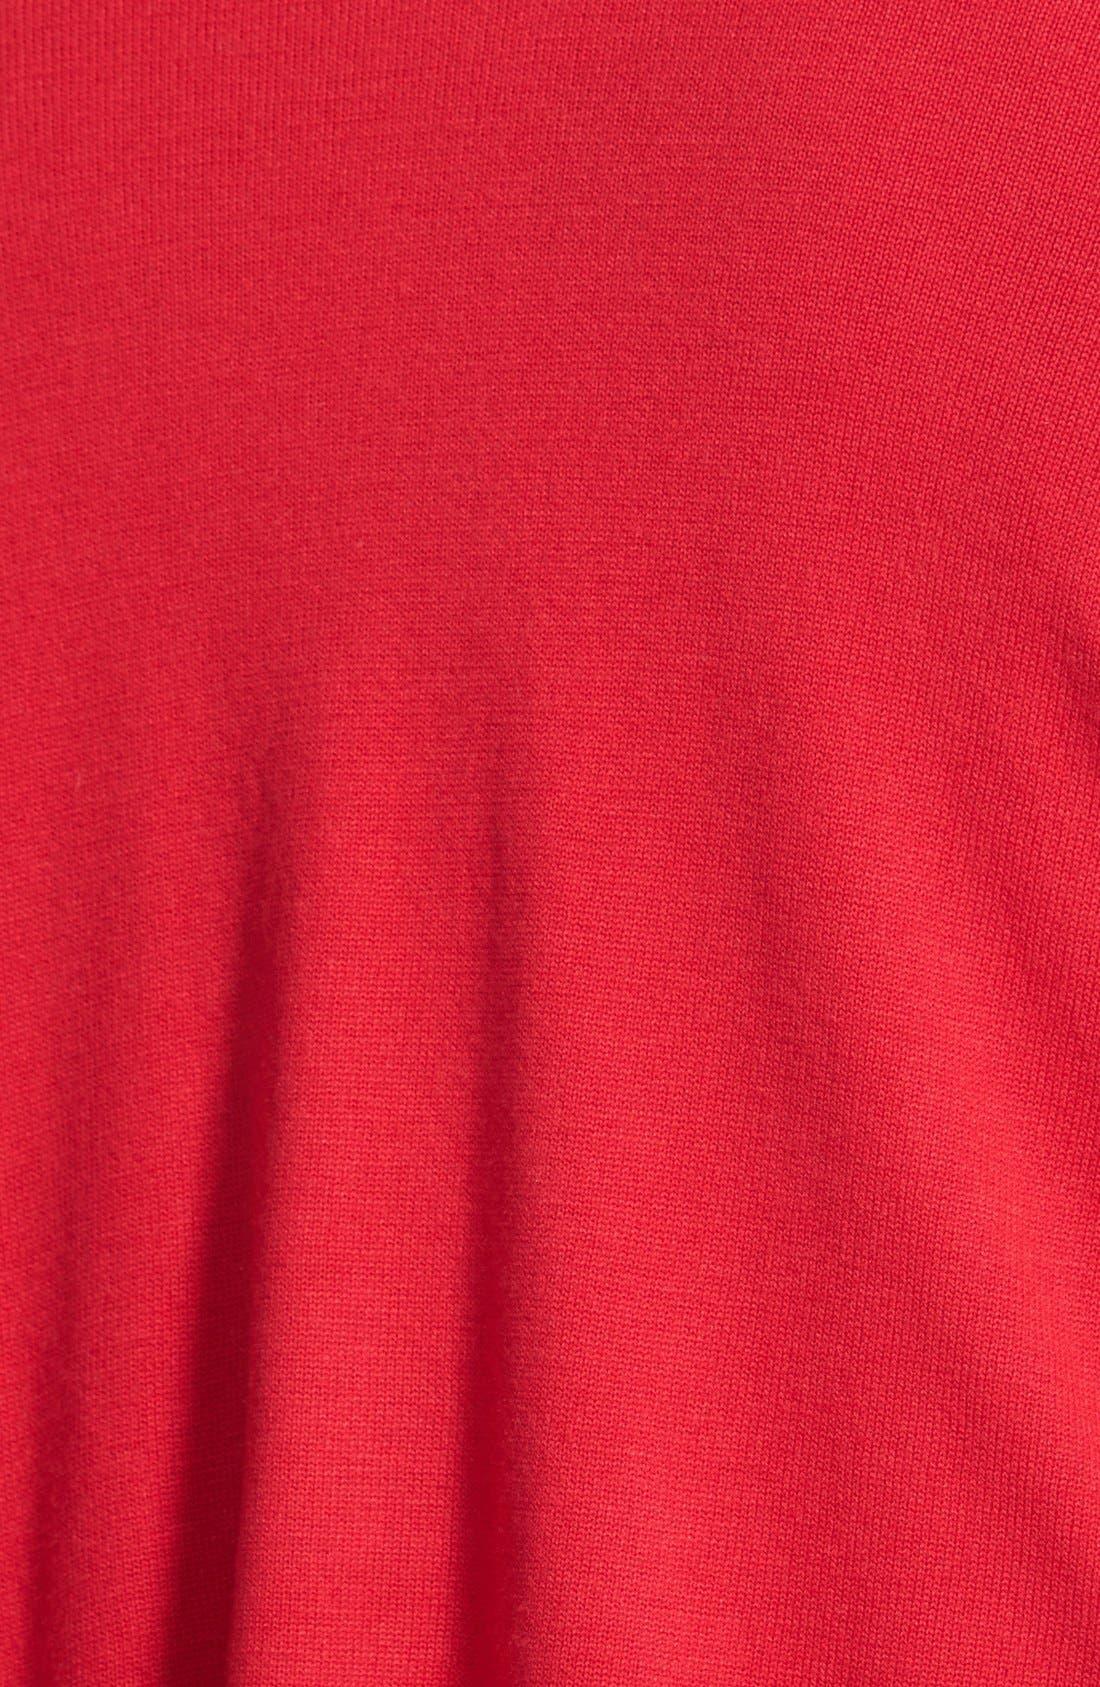 Alternate Image 3  - DKNYC Oversize Drape Front Cardigan (Plus Size)